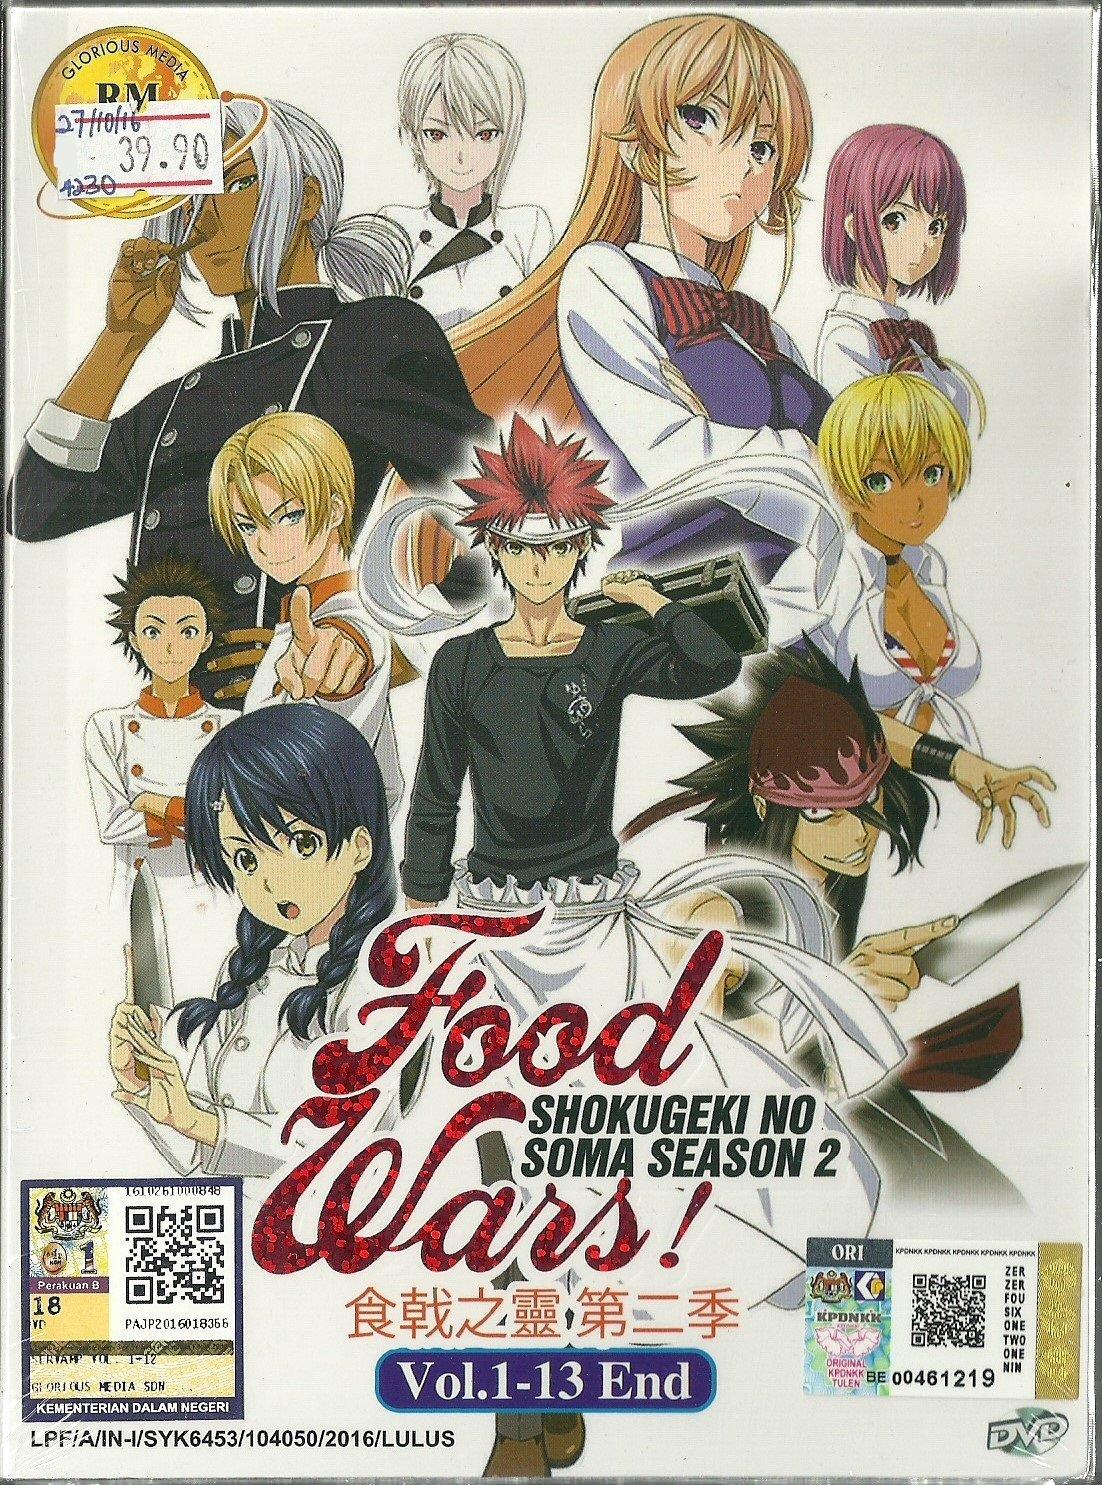 FOOD WAR ! SHOKUGEKI NO SOMA (SEASON 2) - COMPLETE ANIME TV SERIES DVD BOX SET (1-13 EPISODES)